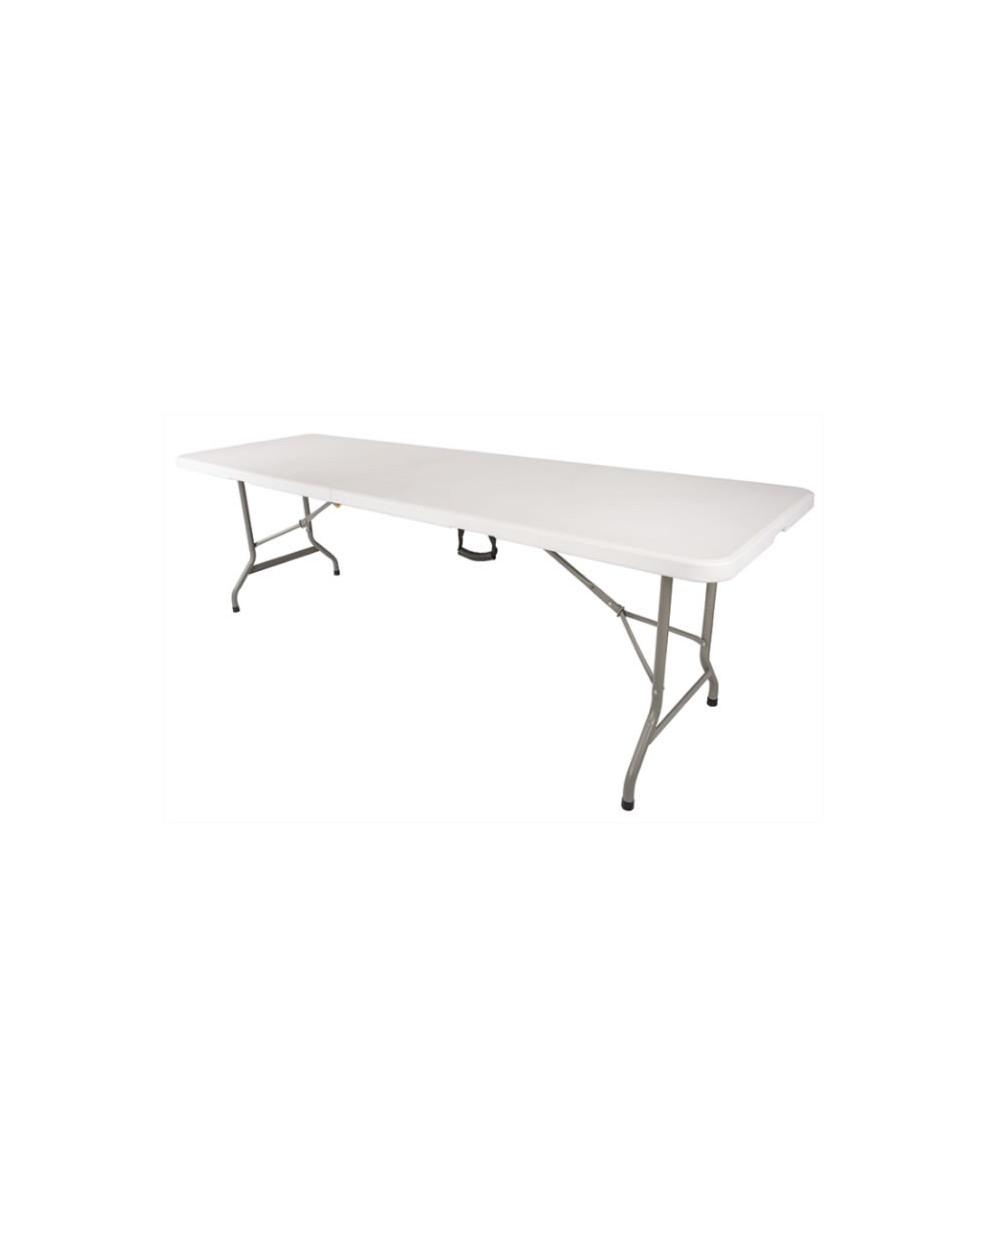 Northwest Mesa Rectangular Plegable Table 244